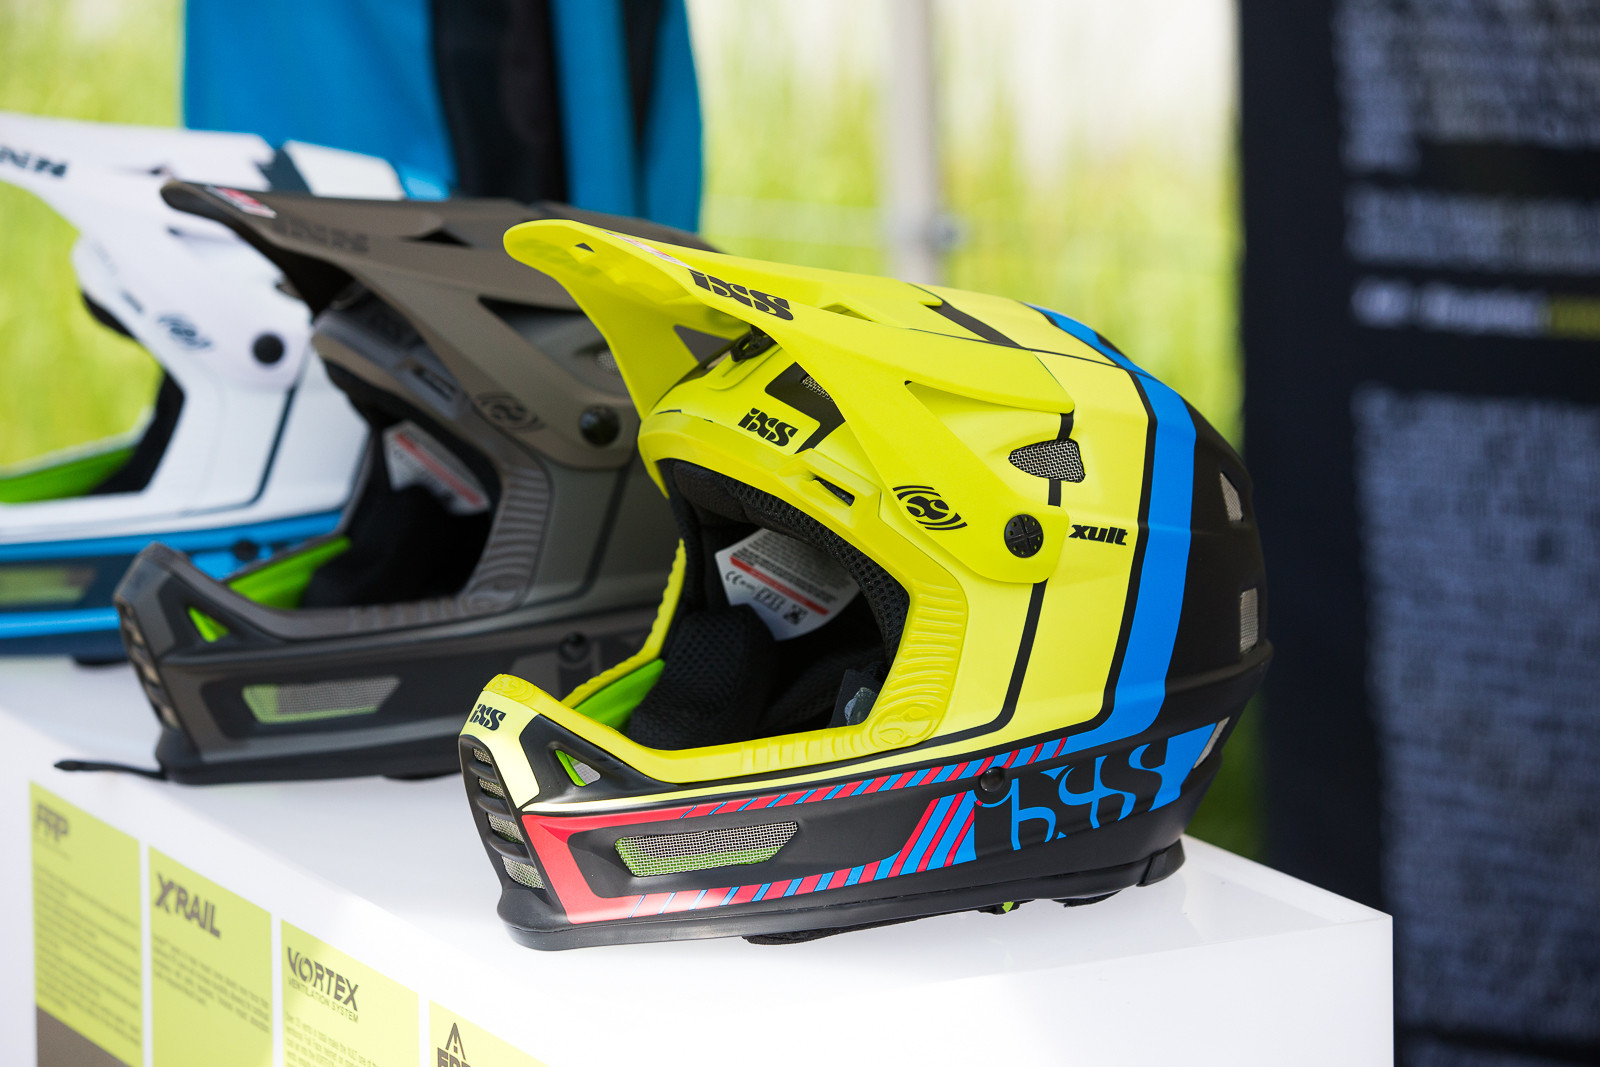 iXS Xult Fullface Helmets - PIT BITS - World Cup Lenzerheide, Switzerland - Mountain Biking Pictures - Vital MTB